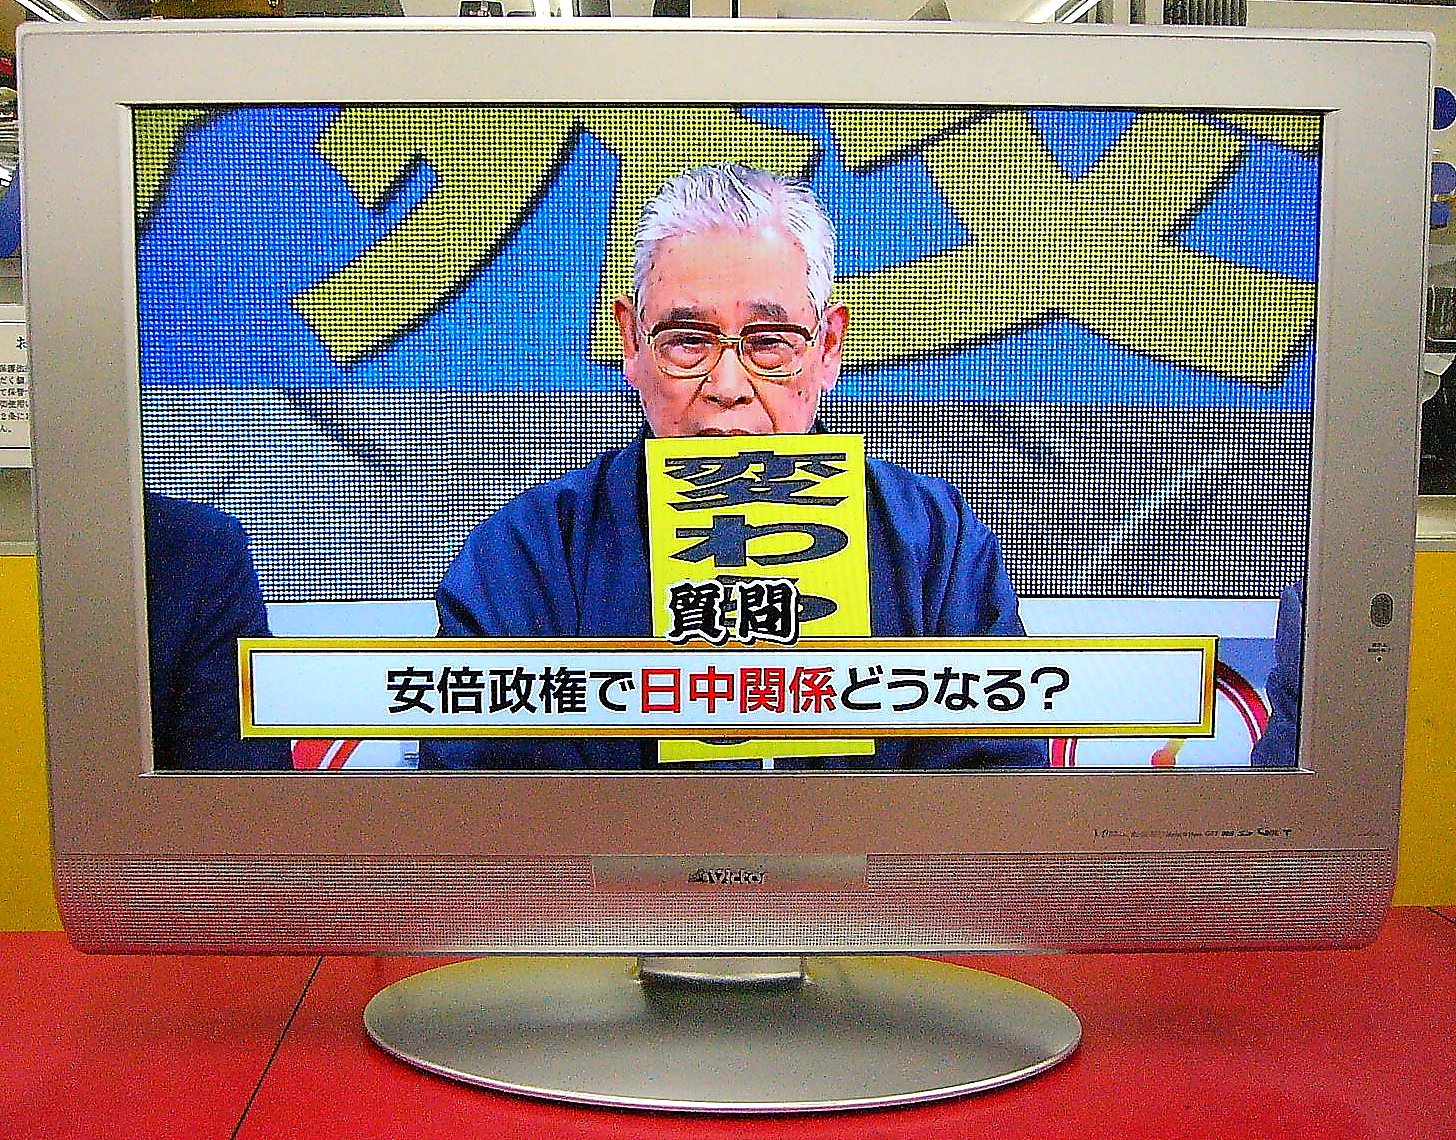 Victor 液晶テレビ LT-32LC 50S